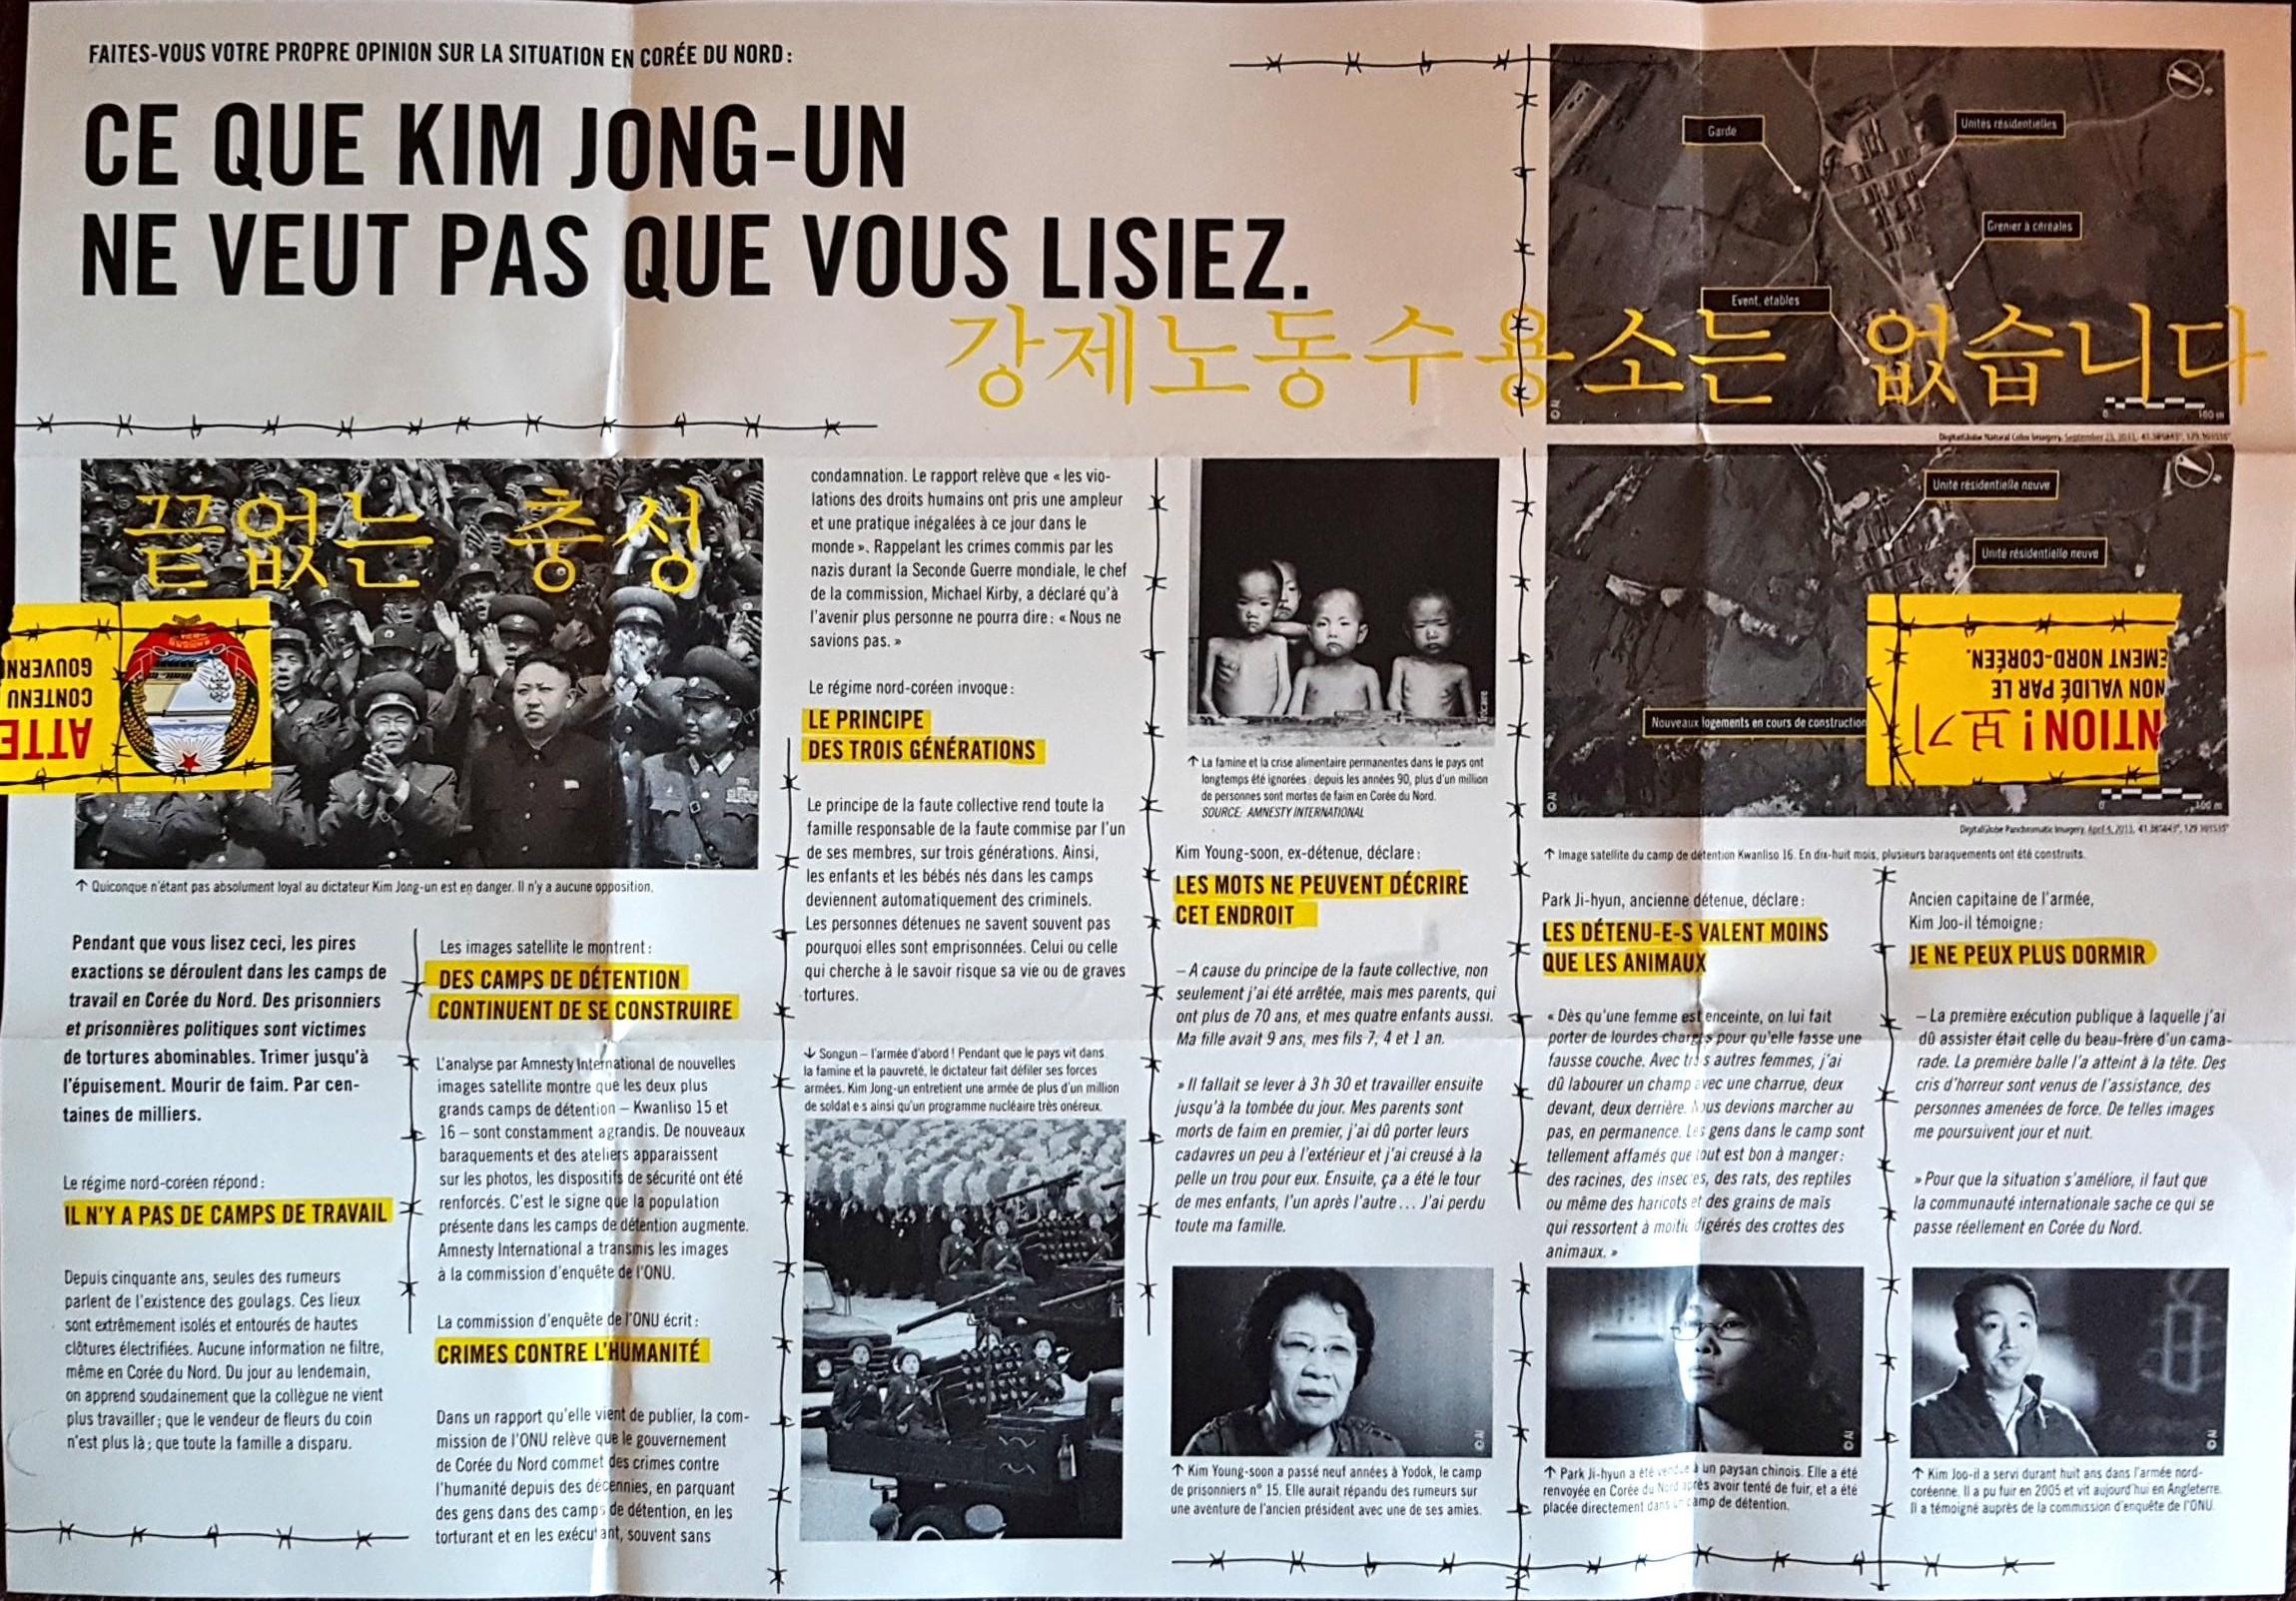 amnistia internacional suica_1